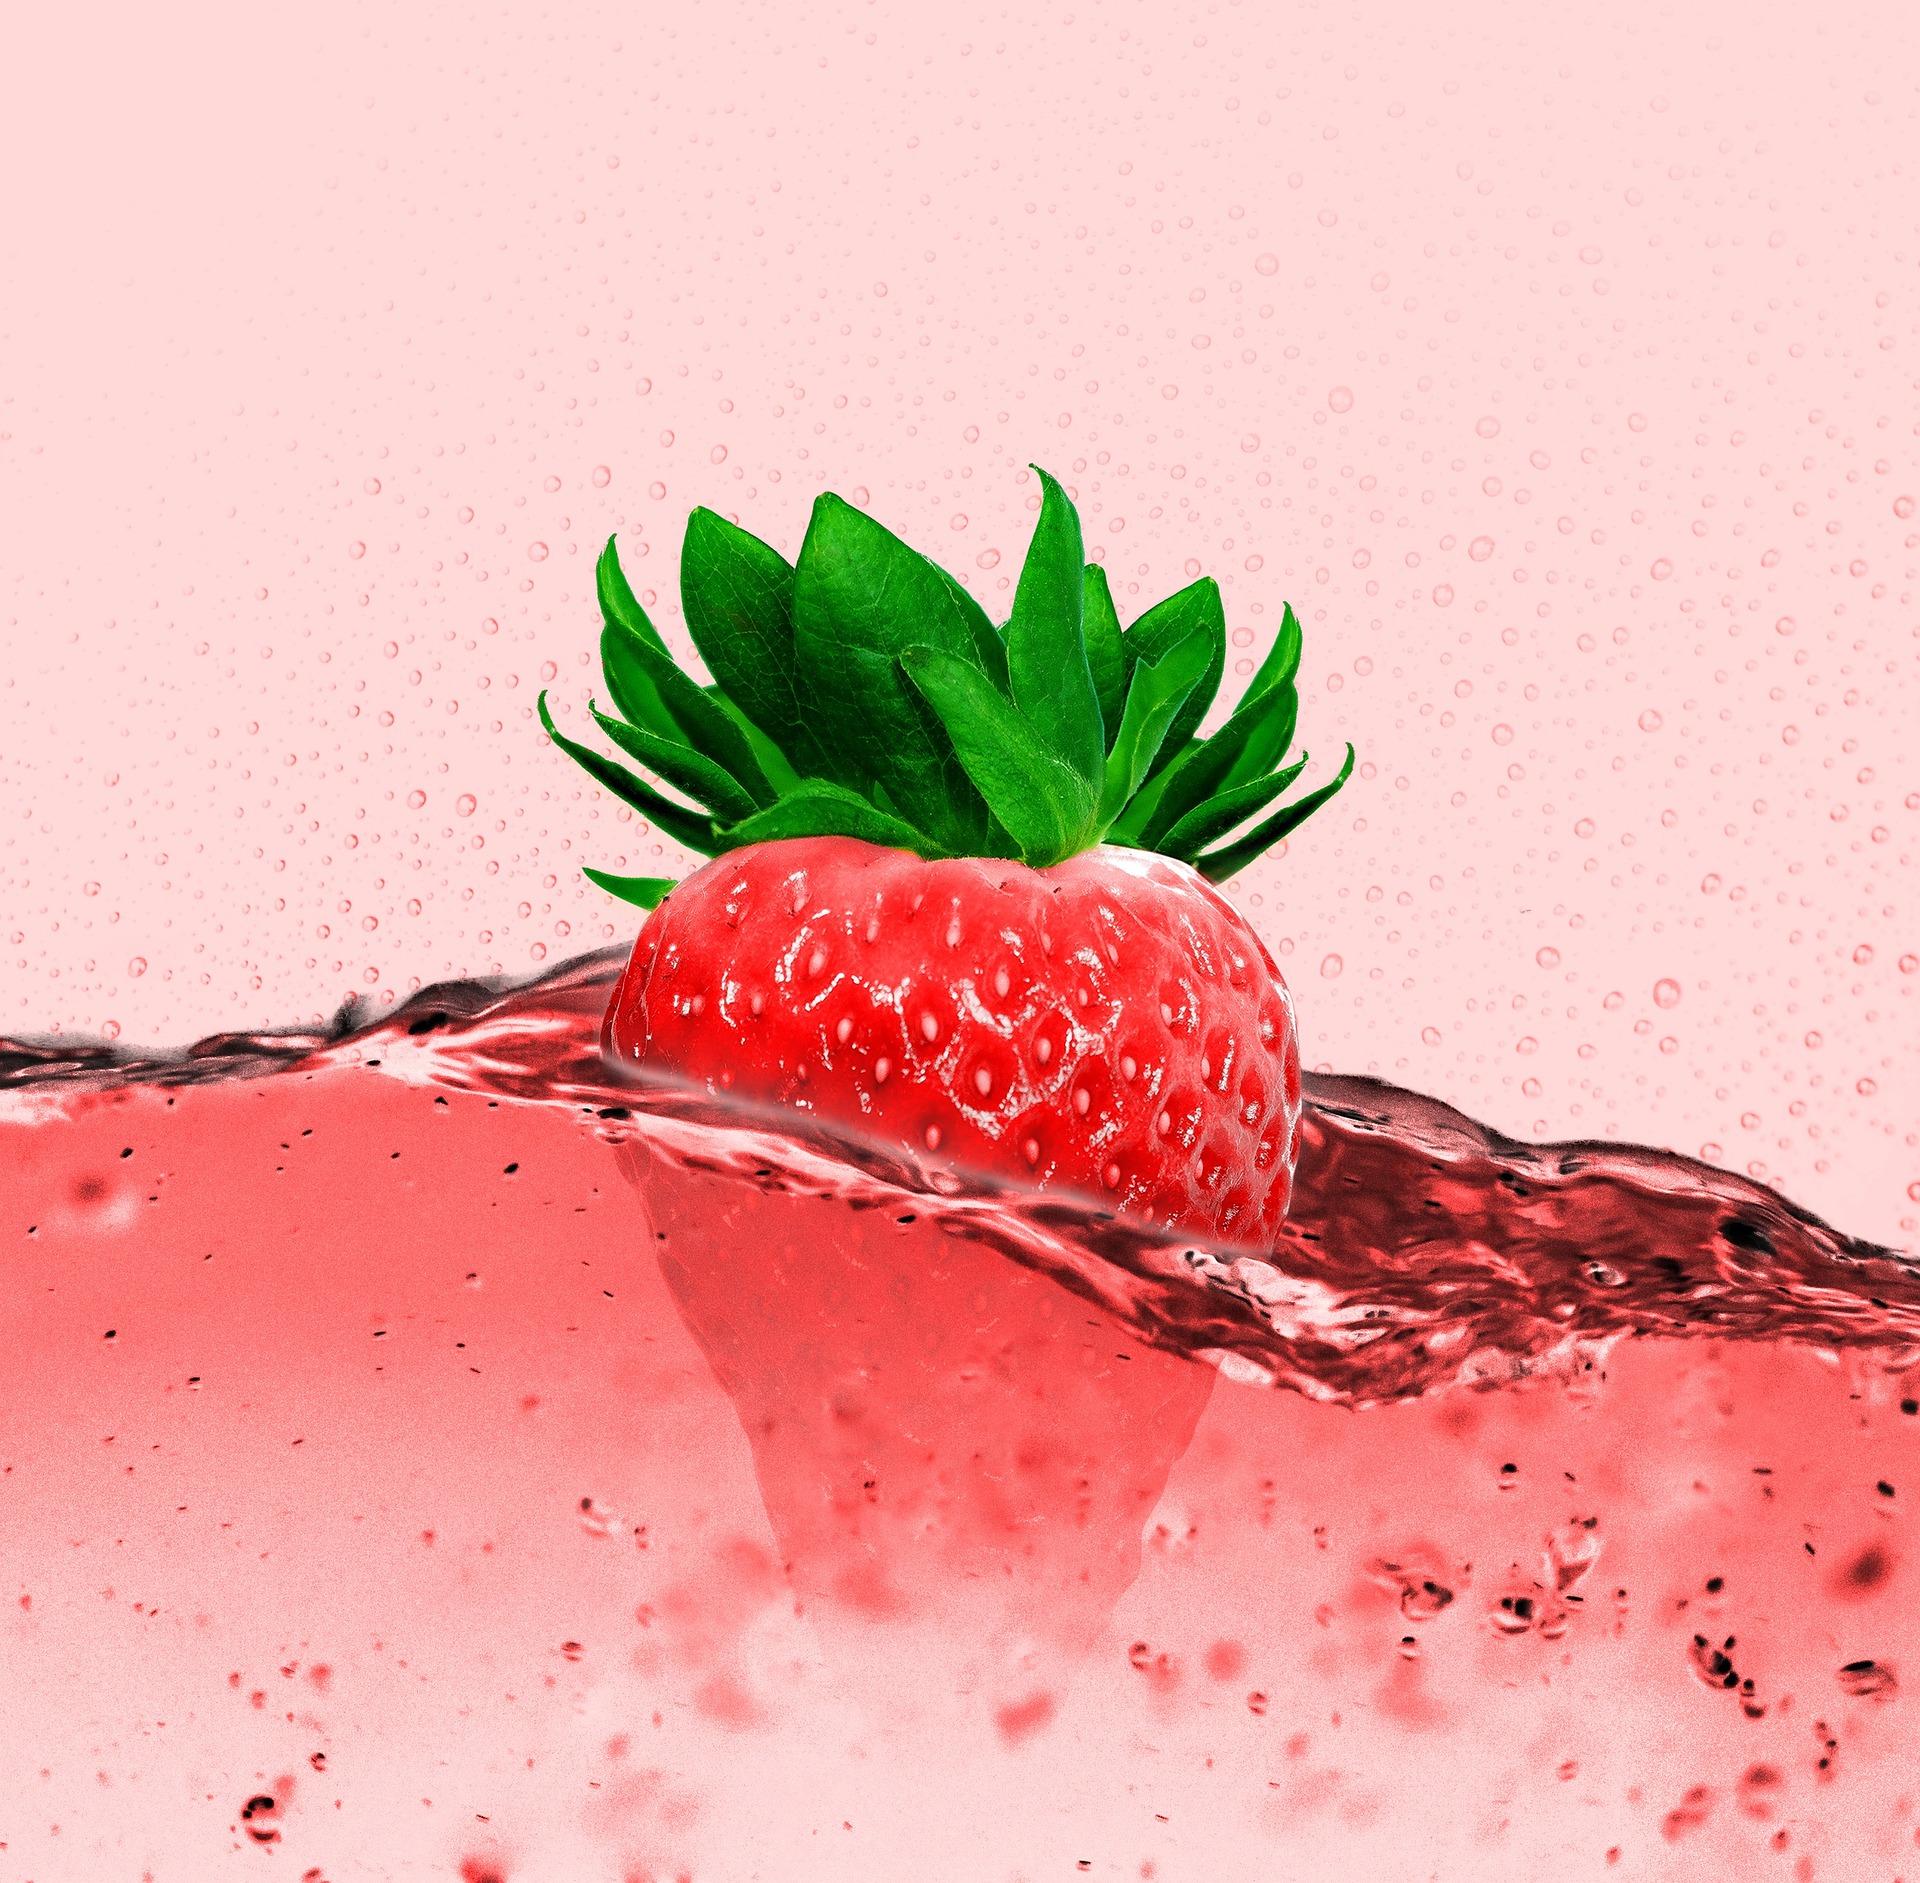 fresa, zumo, bebida, fruta, burbujas, rojo - Fondos de Pantalla HD - professor-falken.com